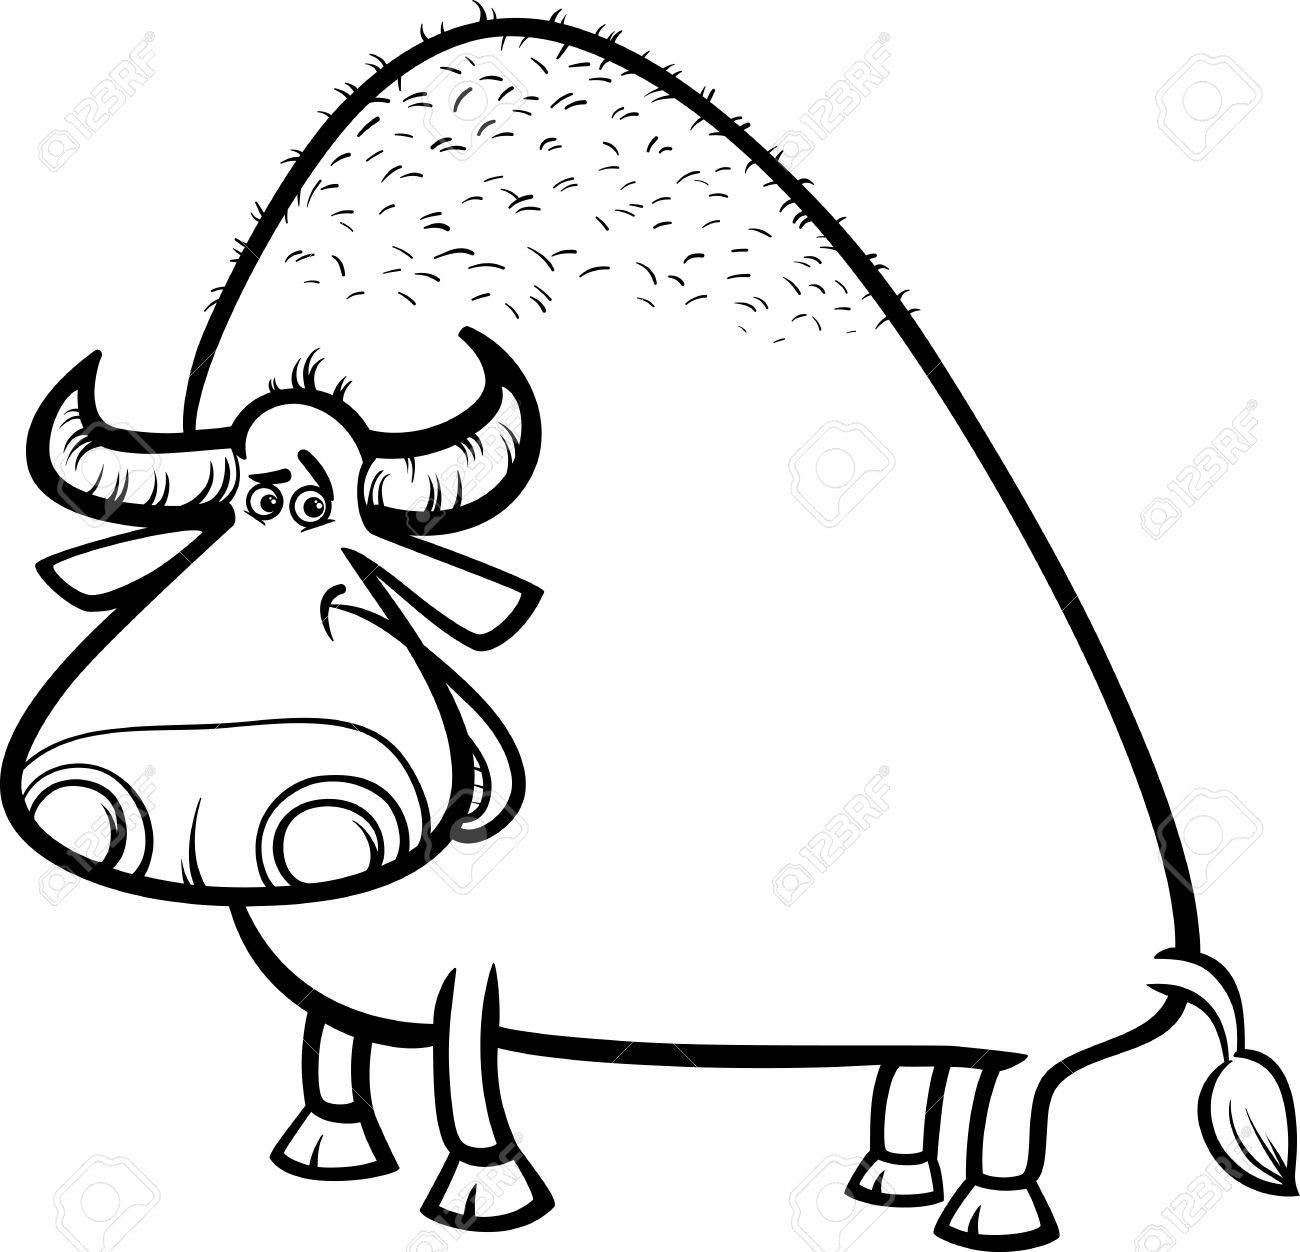 1300x1252 Black And White Cartoon Illustration Of Funny Bull Or Buffalo